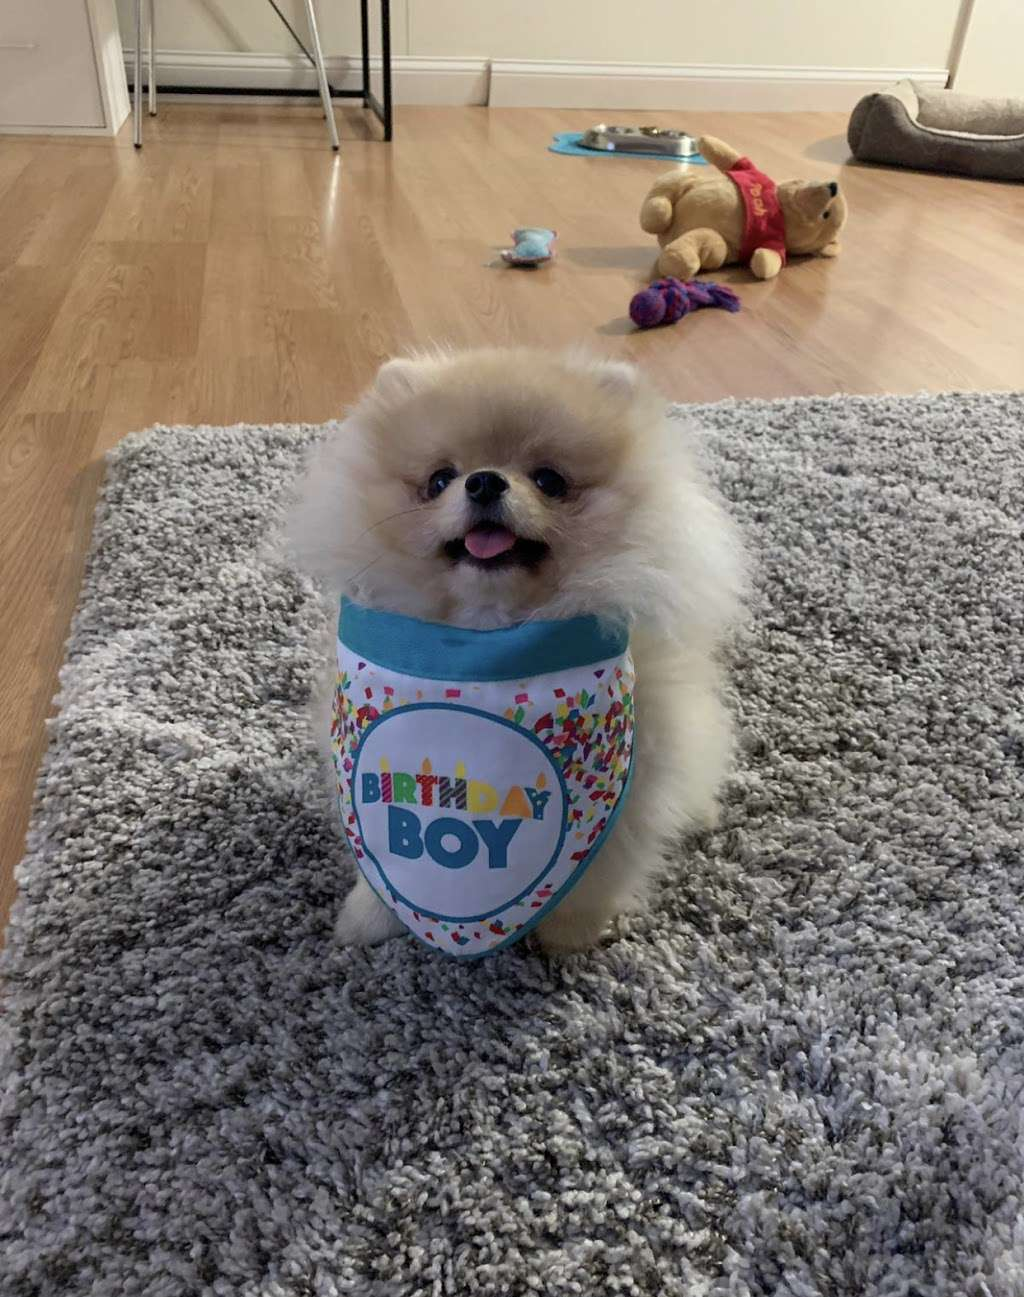 Pomeranian Puppies, Boutique - pet store  | Photo 9 of 10 | Address: Houston, TX, USA | Phone: (650) 303-1599